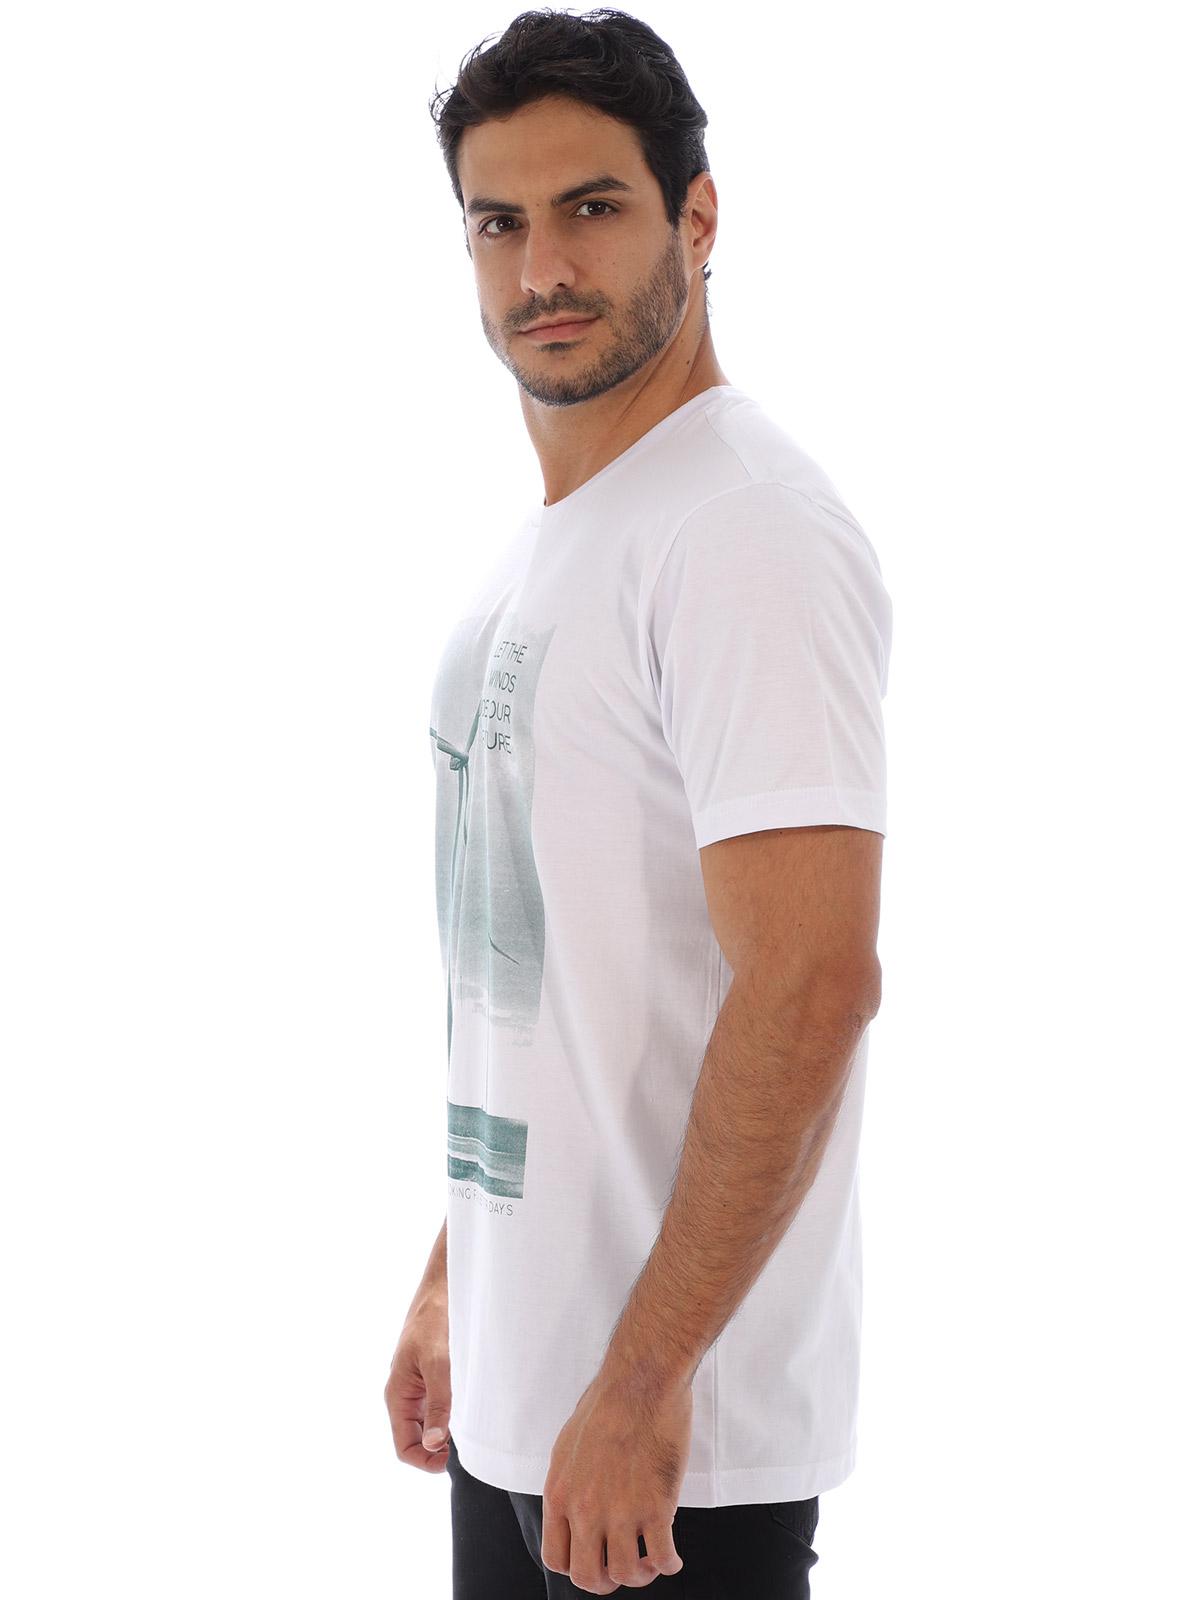 Camiseta Masculina Básica Manga Curta Estampa Aeolic Branca